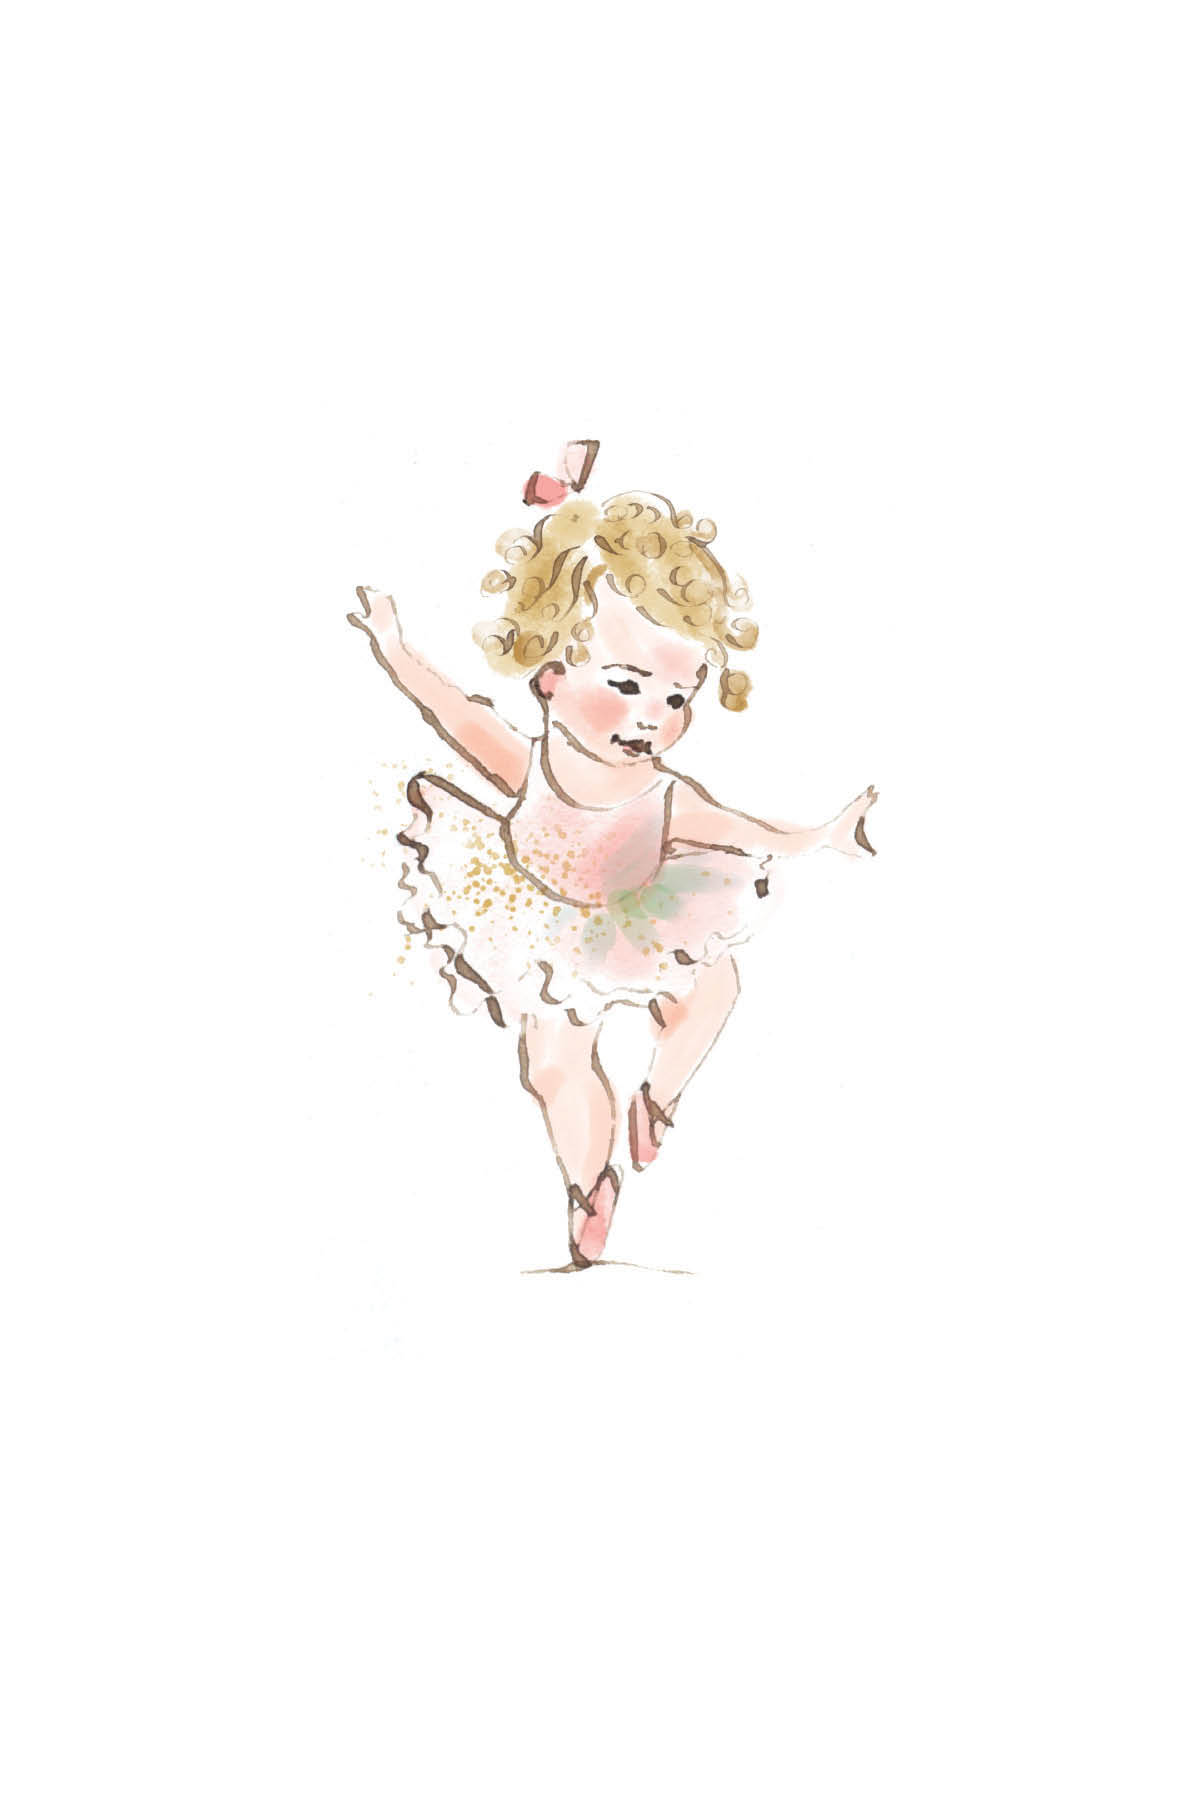 Tiny ballerina | curly blonde